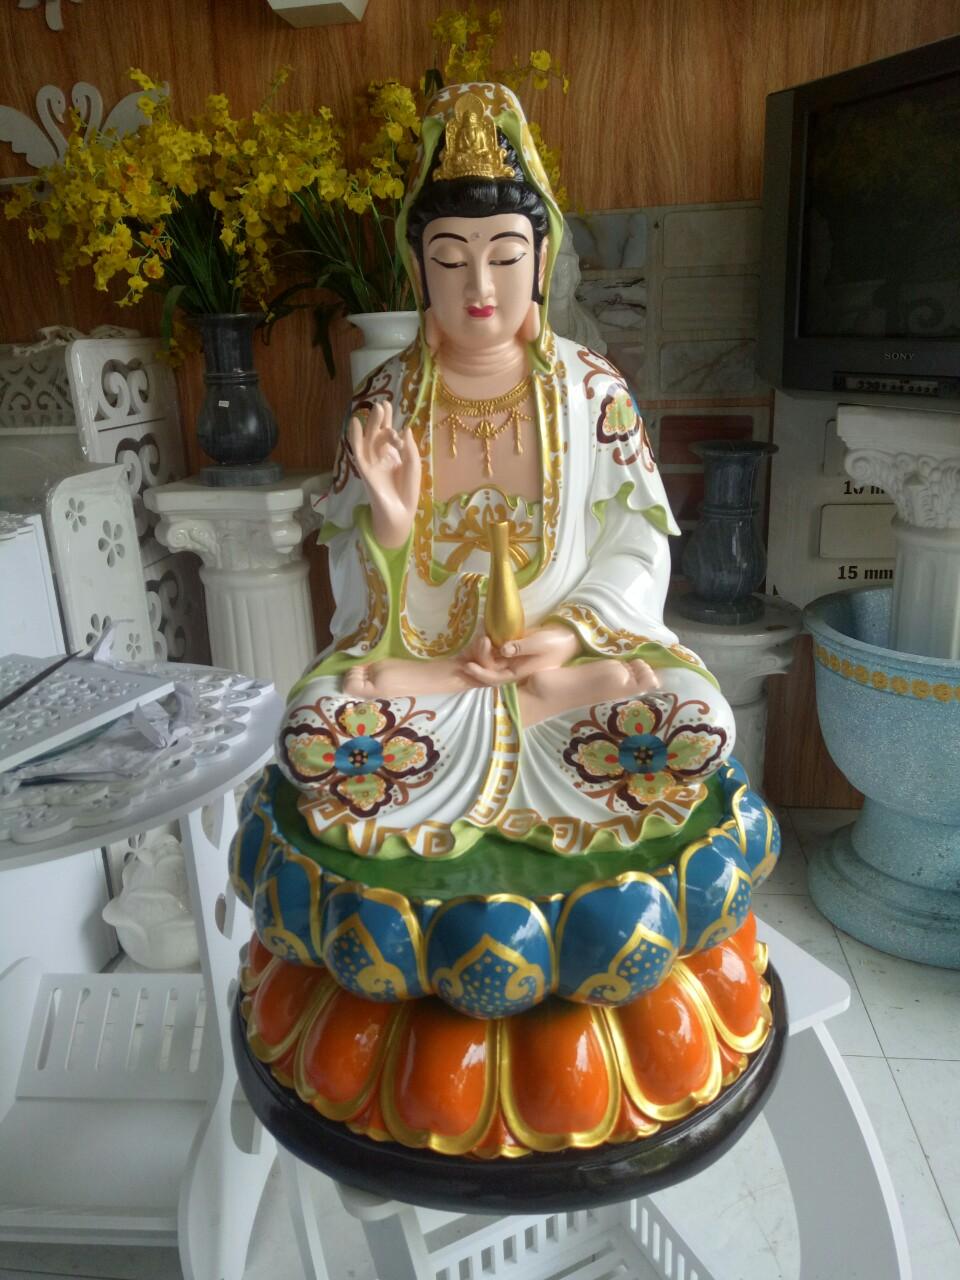 tuong-quan-am-ngoi-70-cm